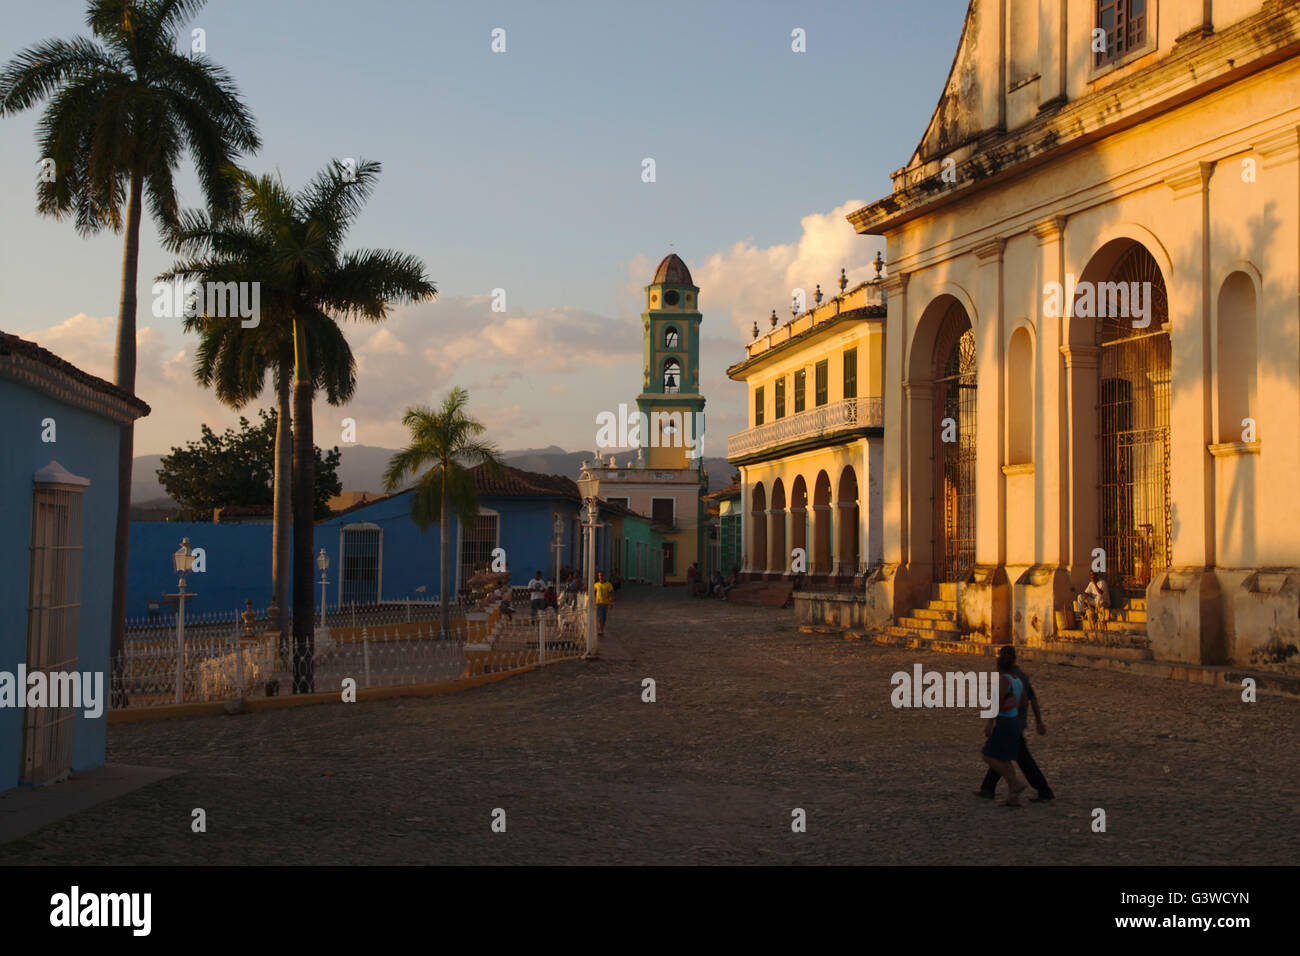 Plaza Mayor with portal of Iglesia Parroquial de la Santisima Trinidad and bell tower of San Francisco convent, - Stock Image